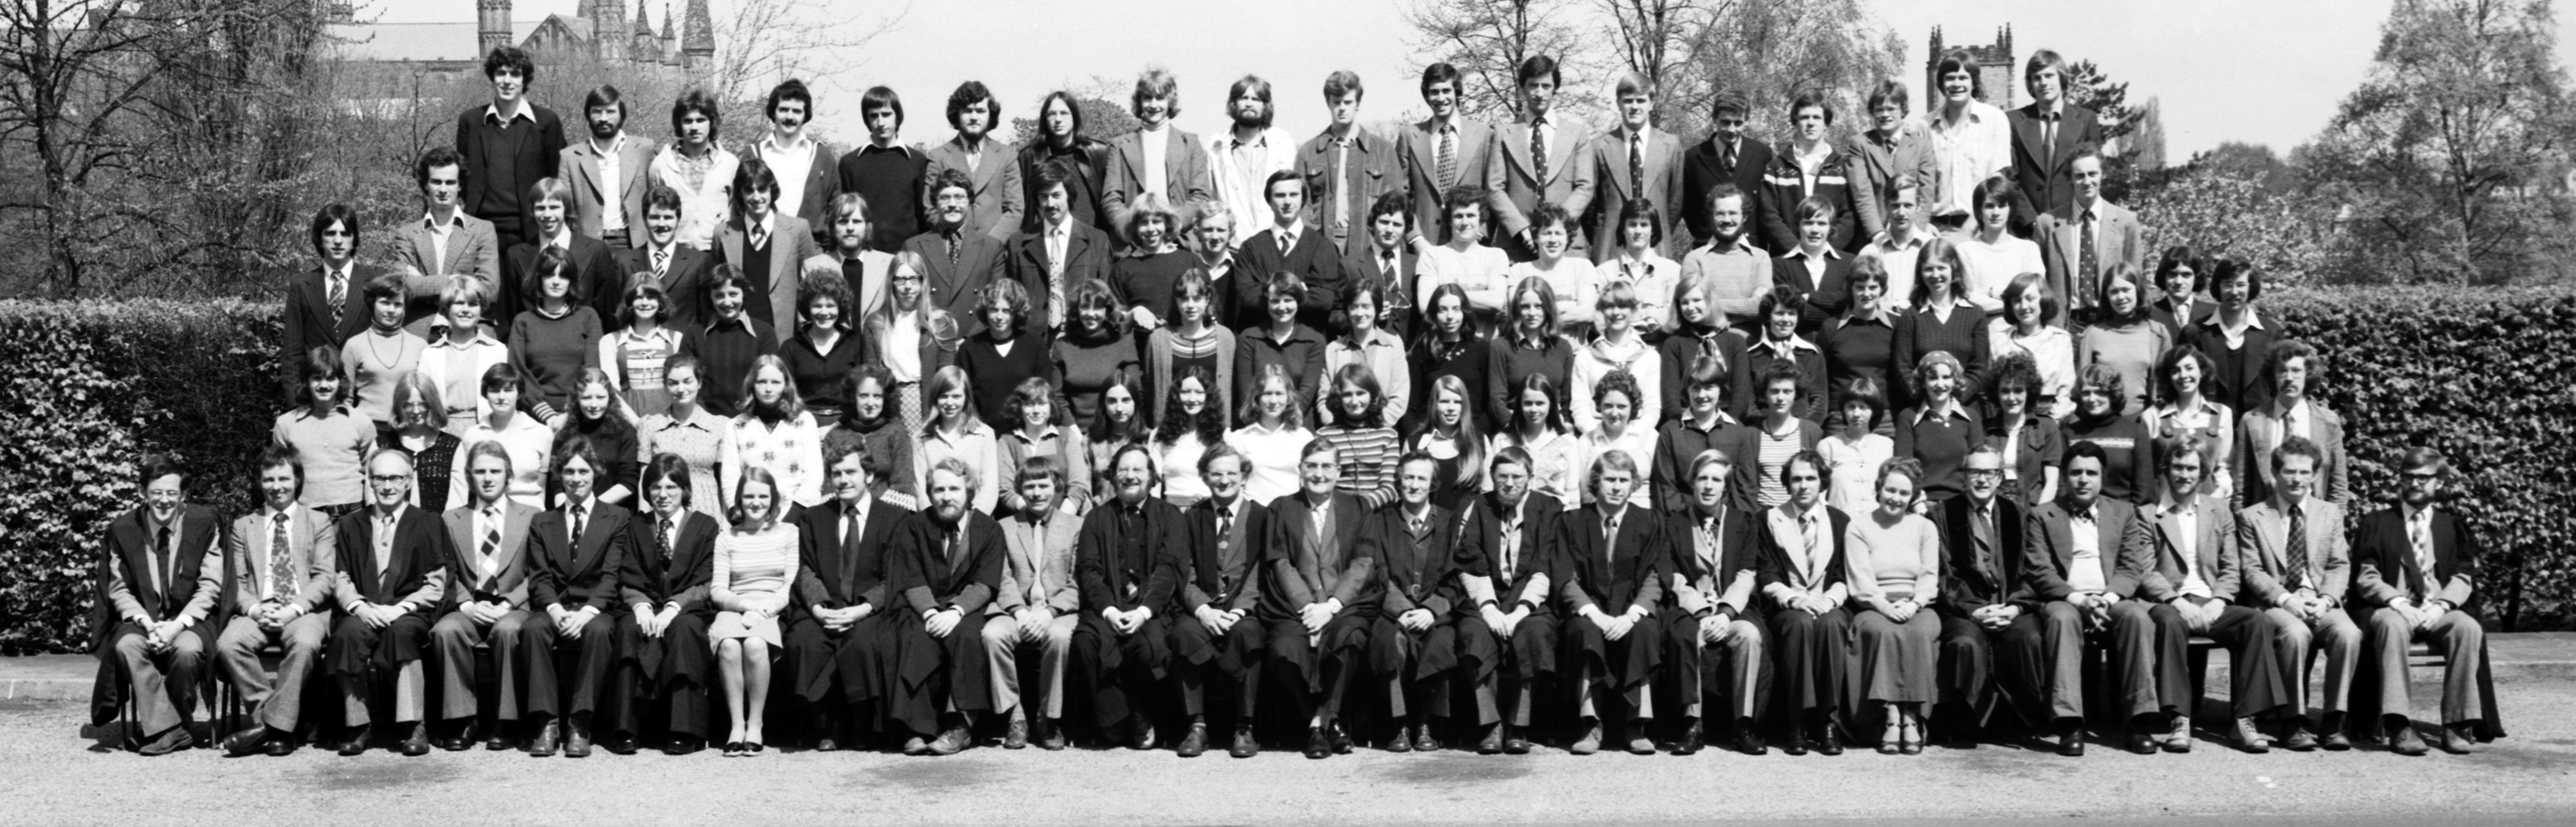 Department Of Geography Graduation 1970 1979 Durham